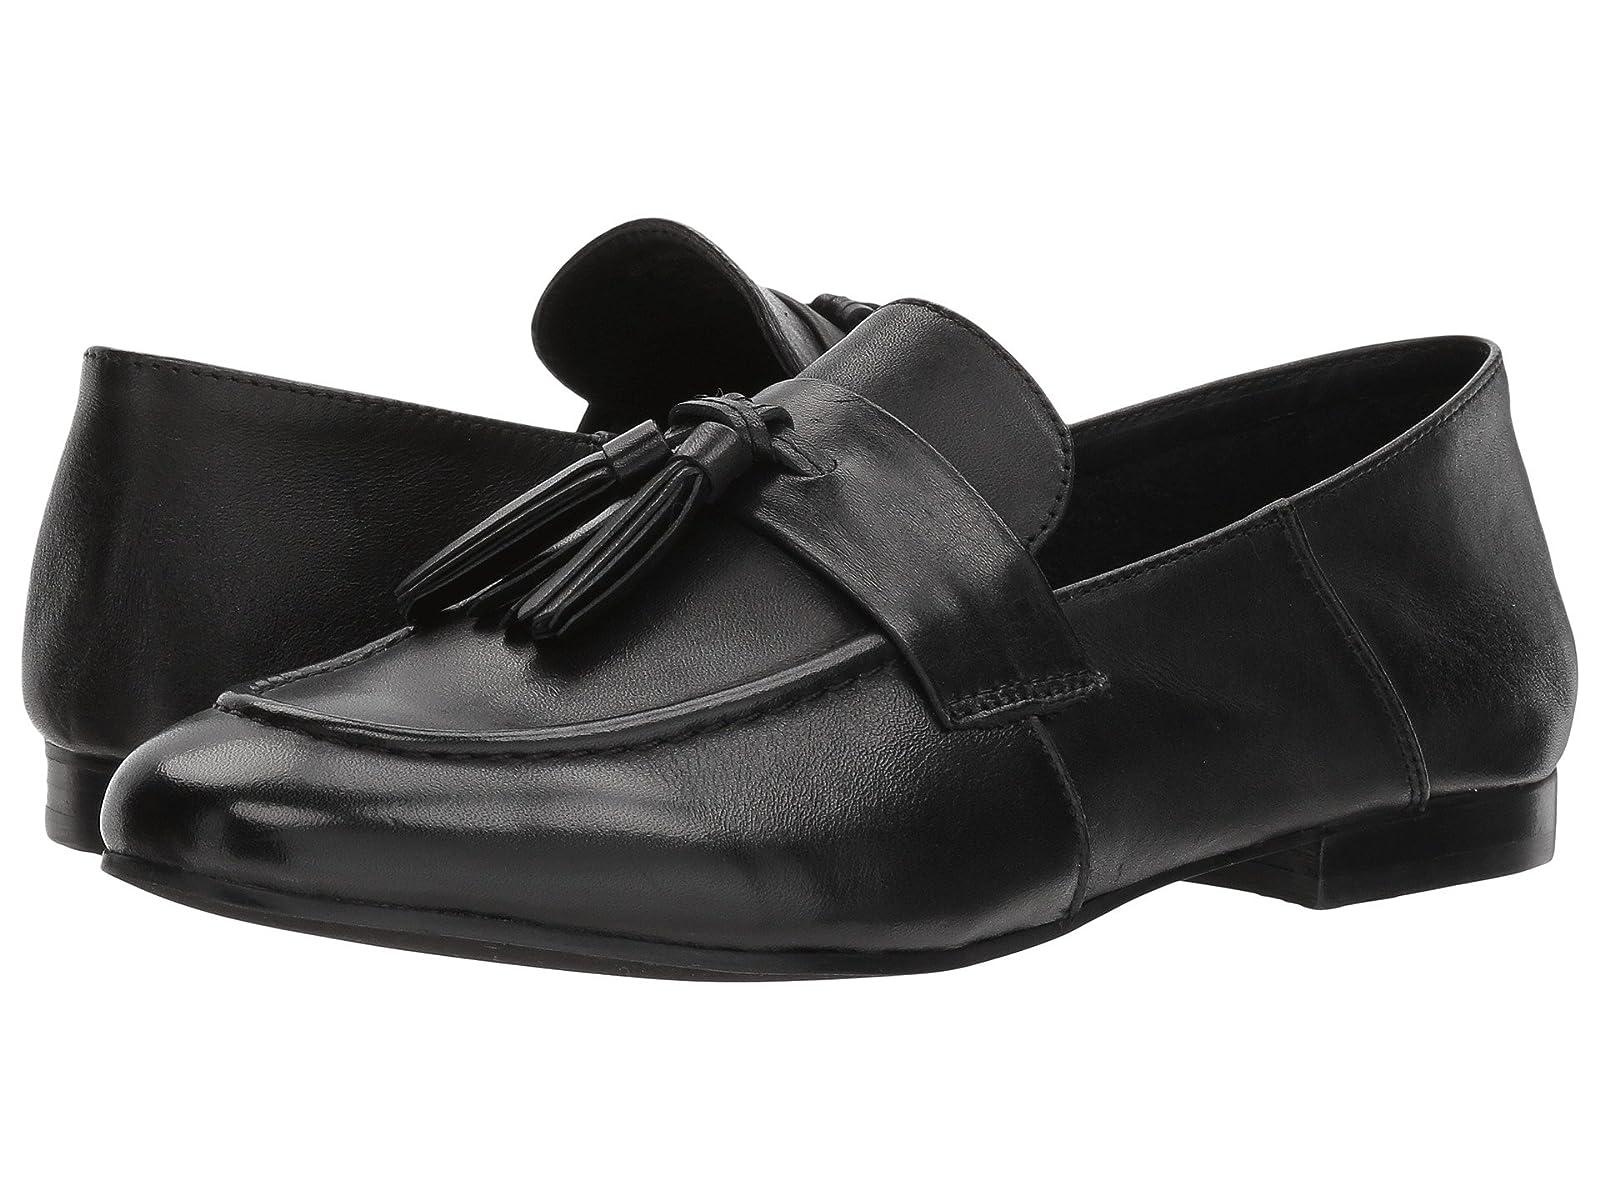 Steve Madden BeckCheap and distinctive eye-catching shoes